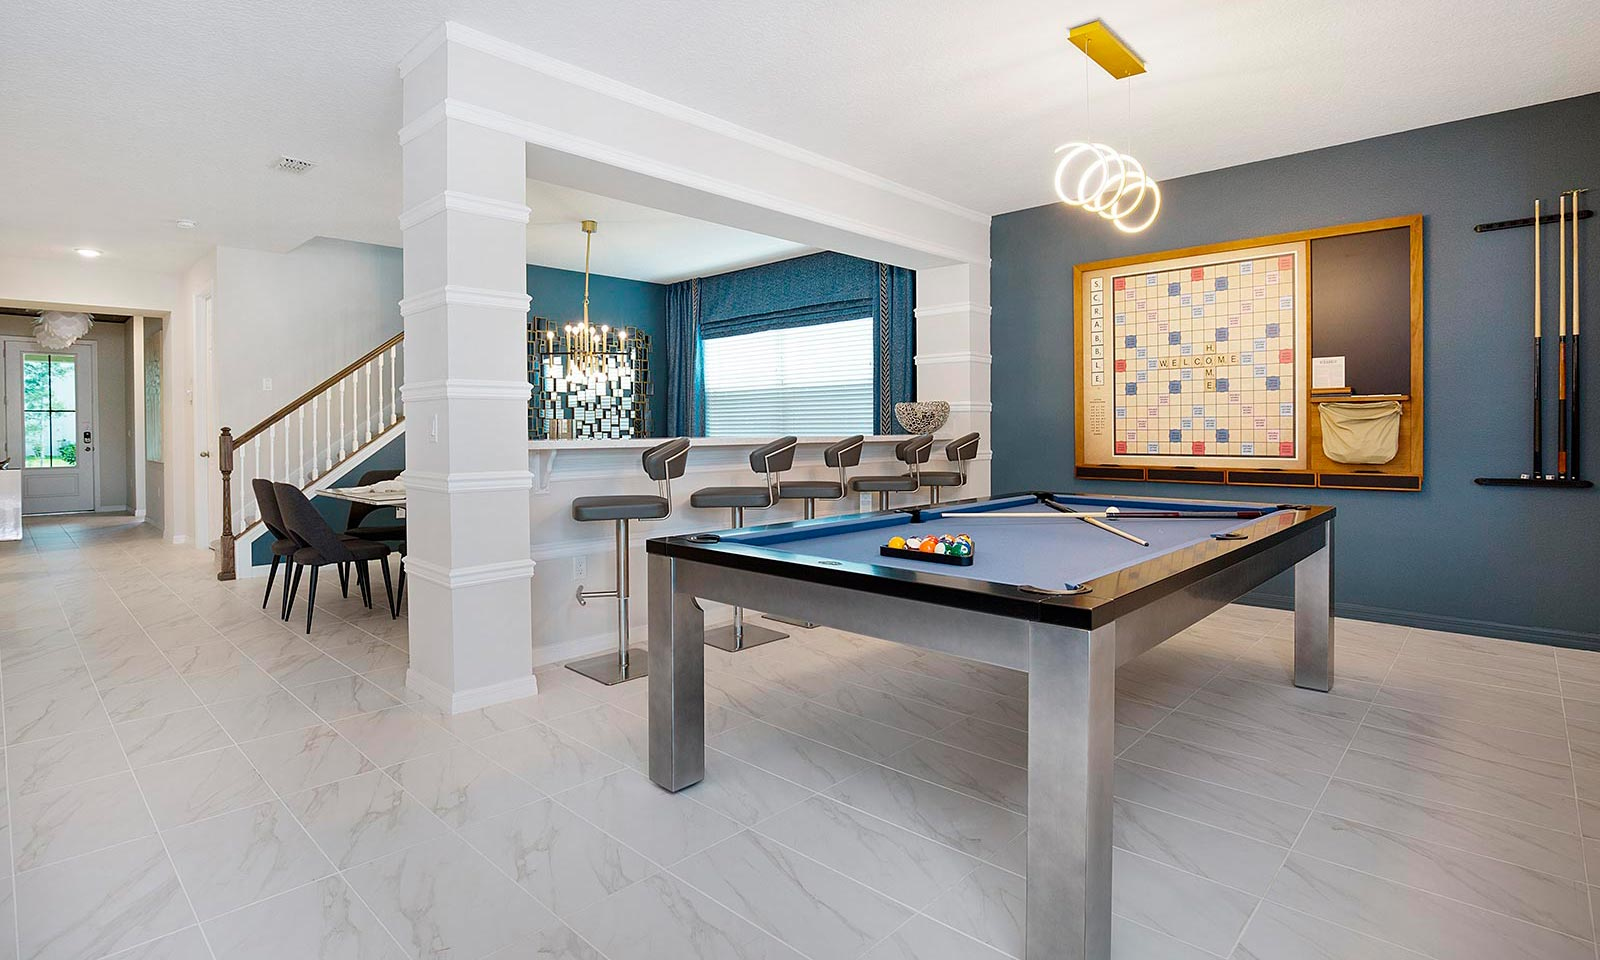 [amenities:Pool-Table:3] Pool Table